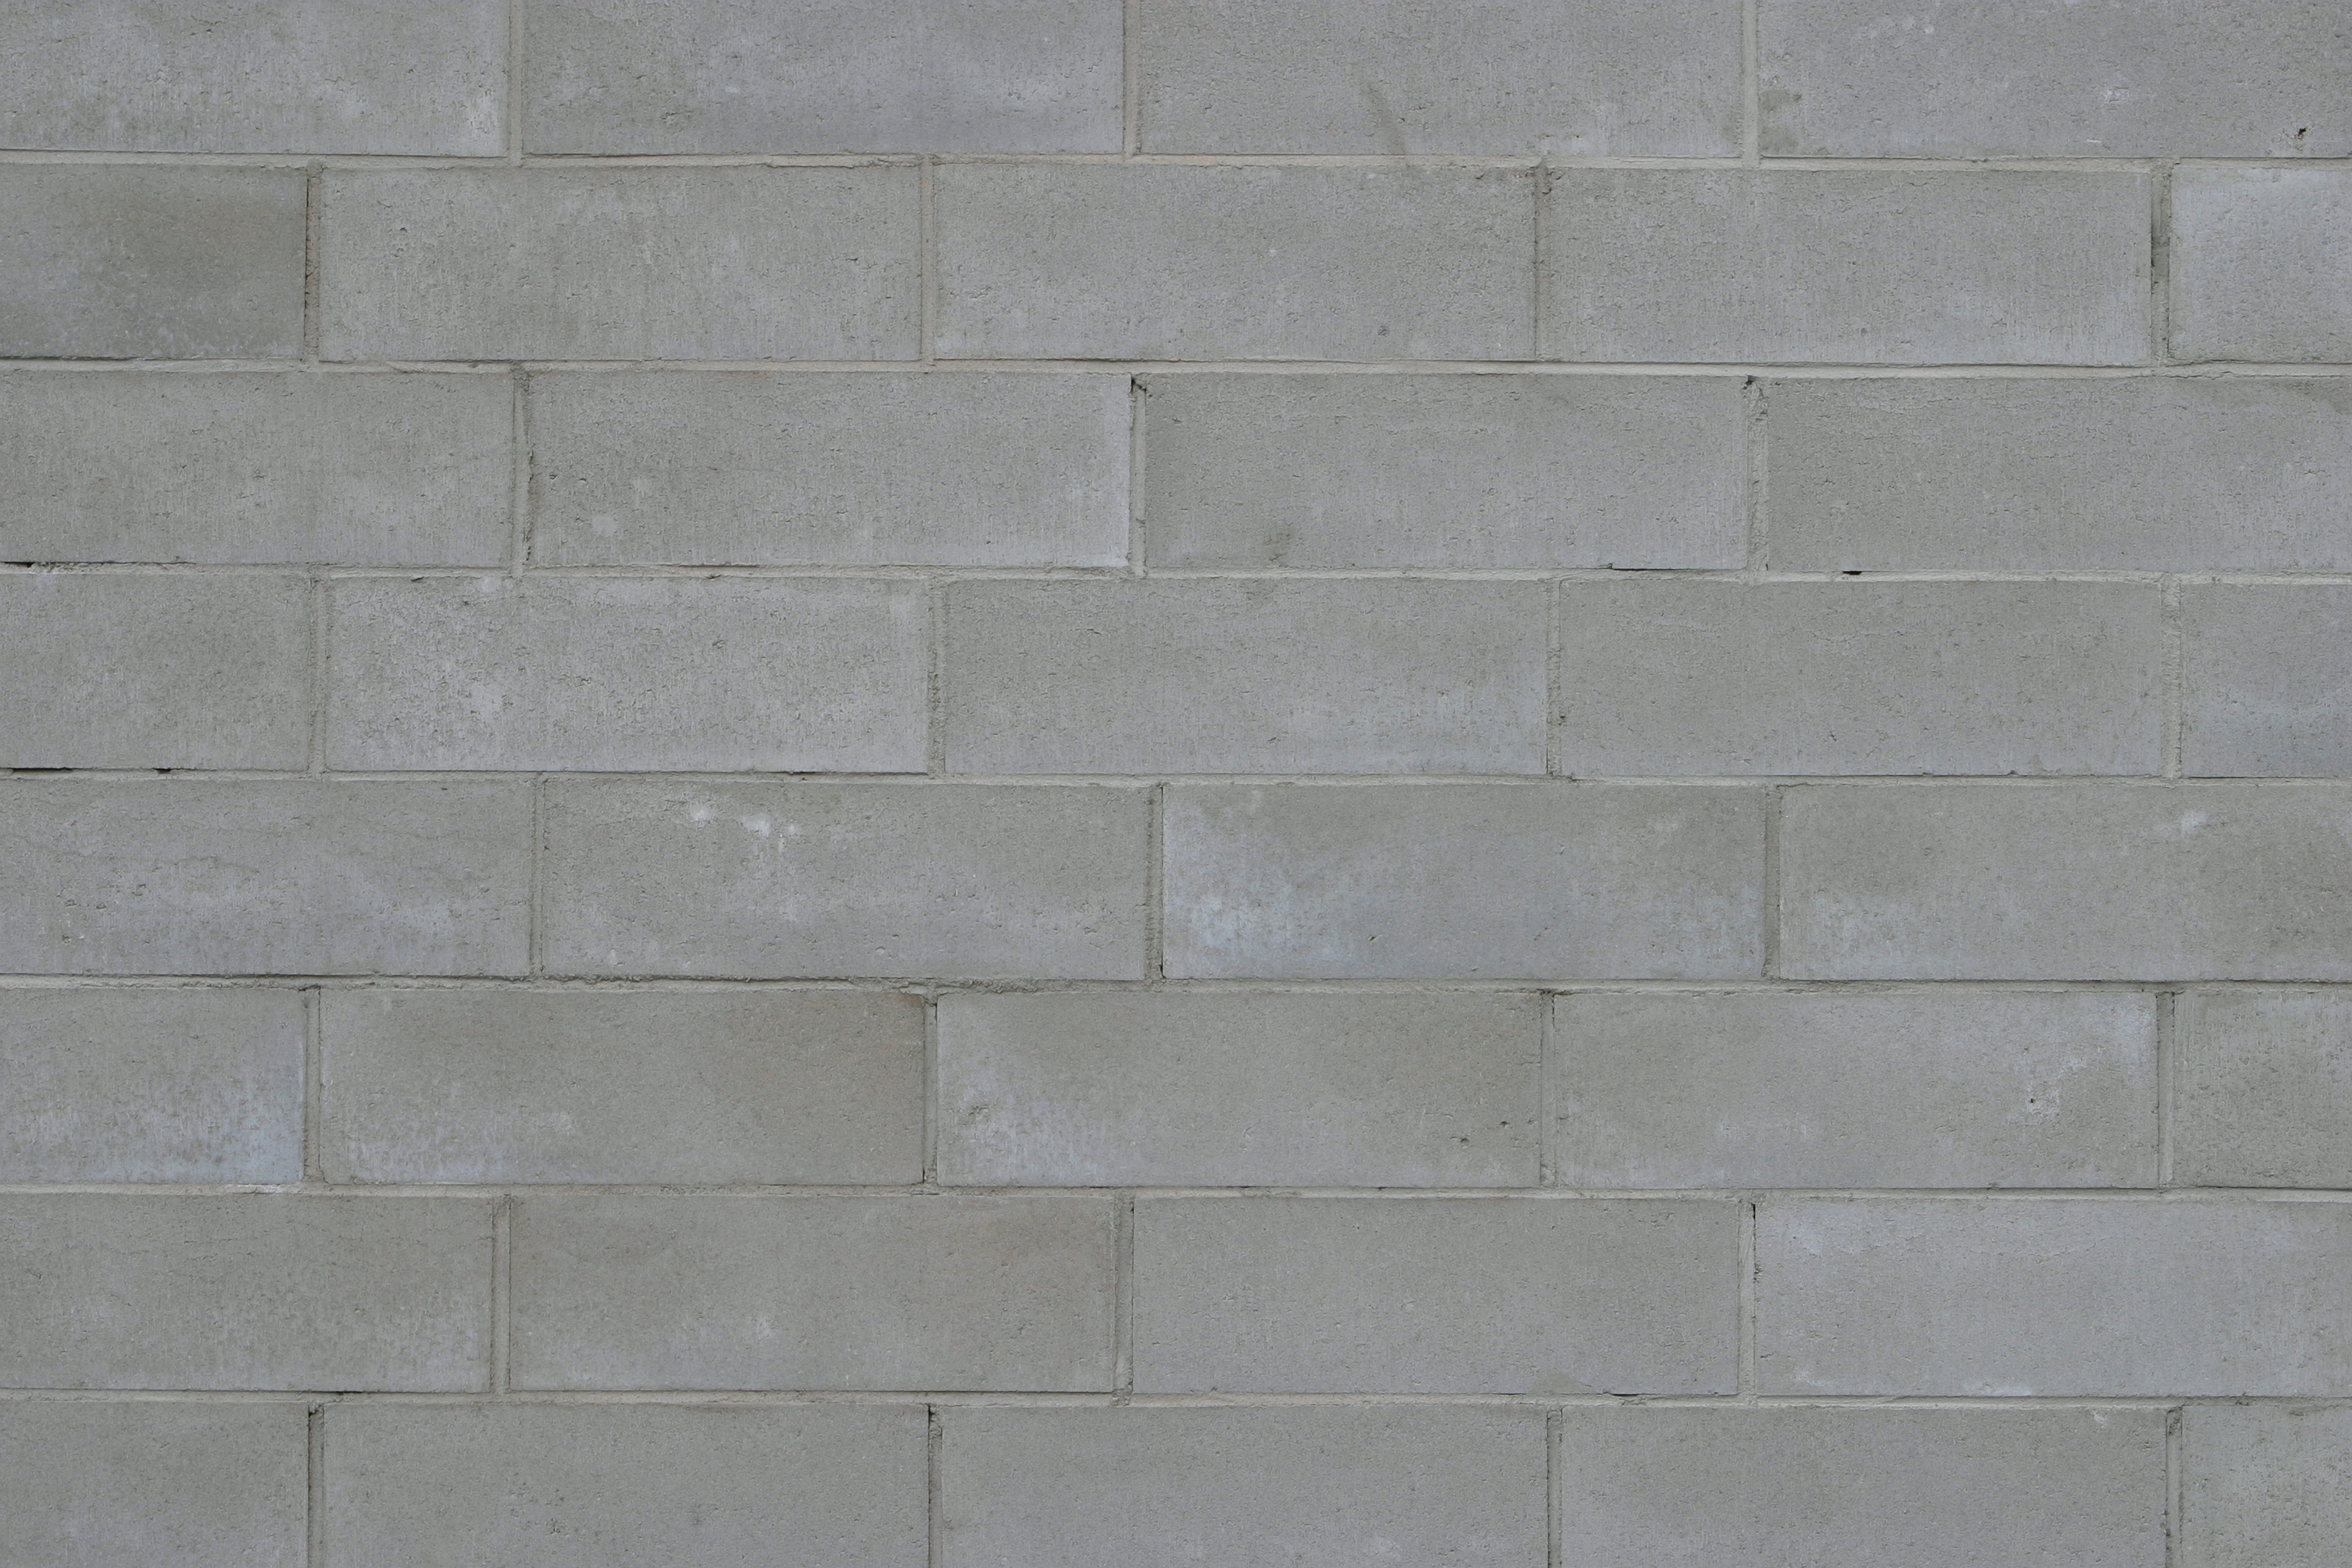 Pintar muro de bloques de hormigon good el pintado del - Muro de bloques ...